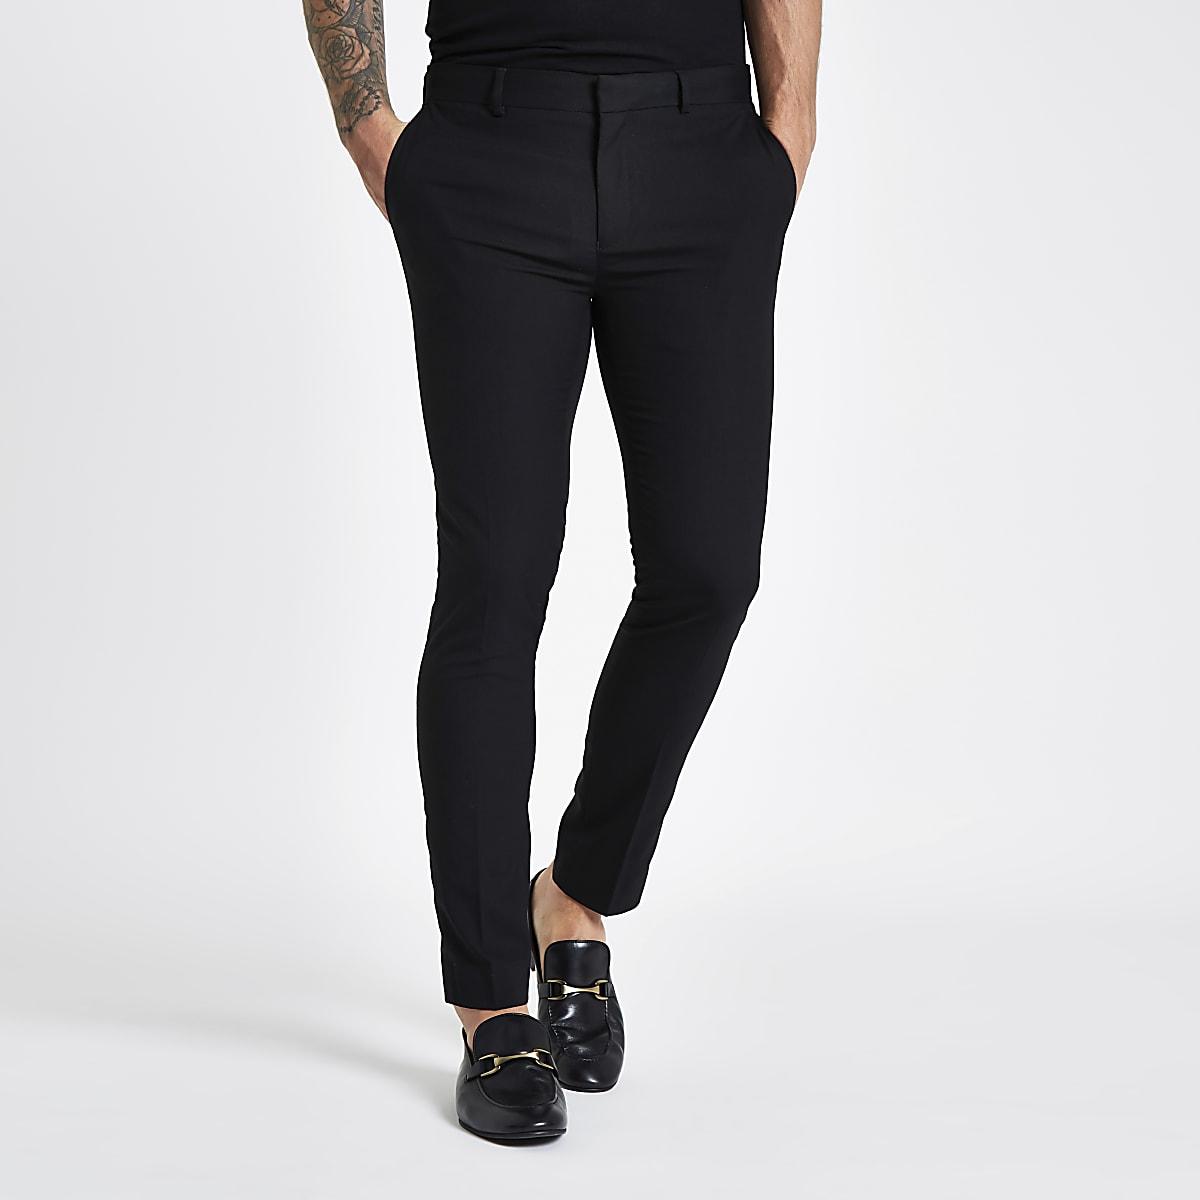 Black super skinny smart pants